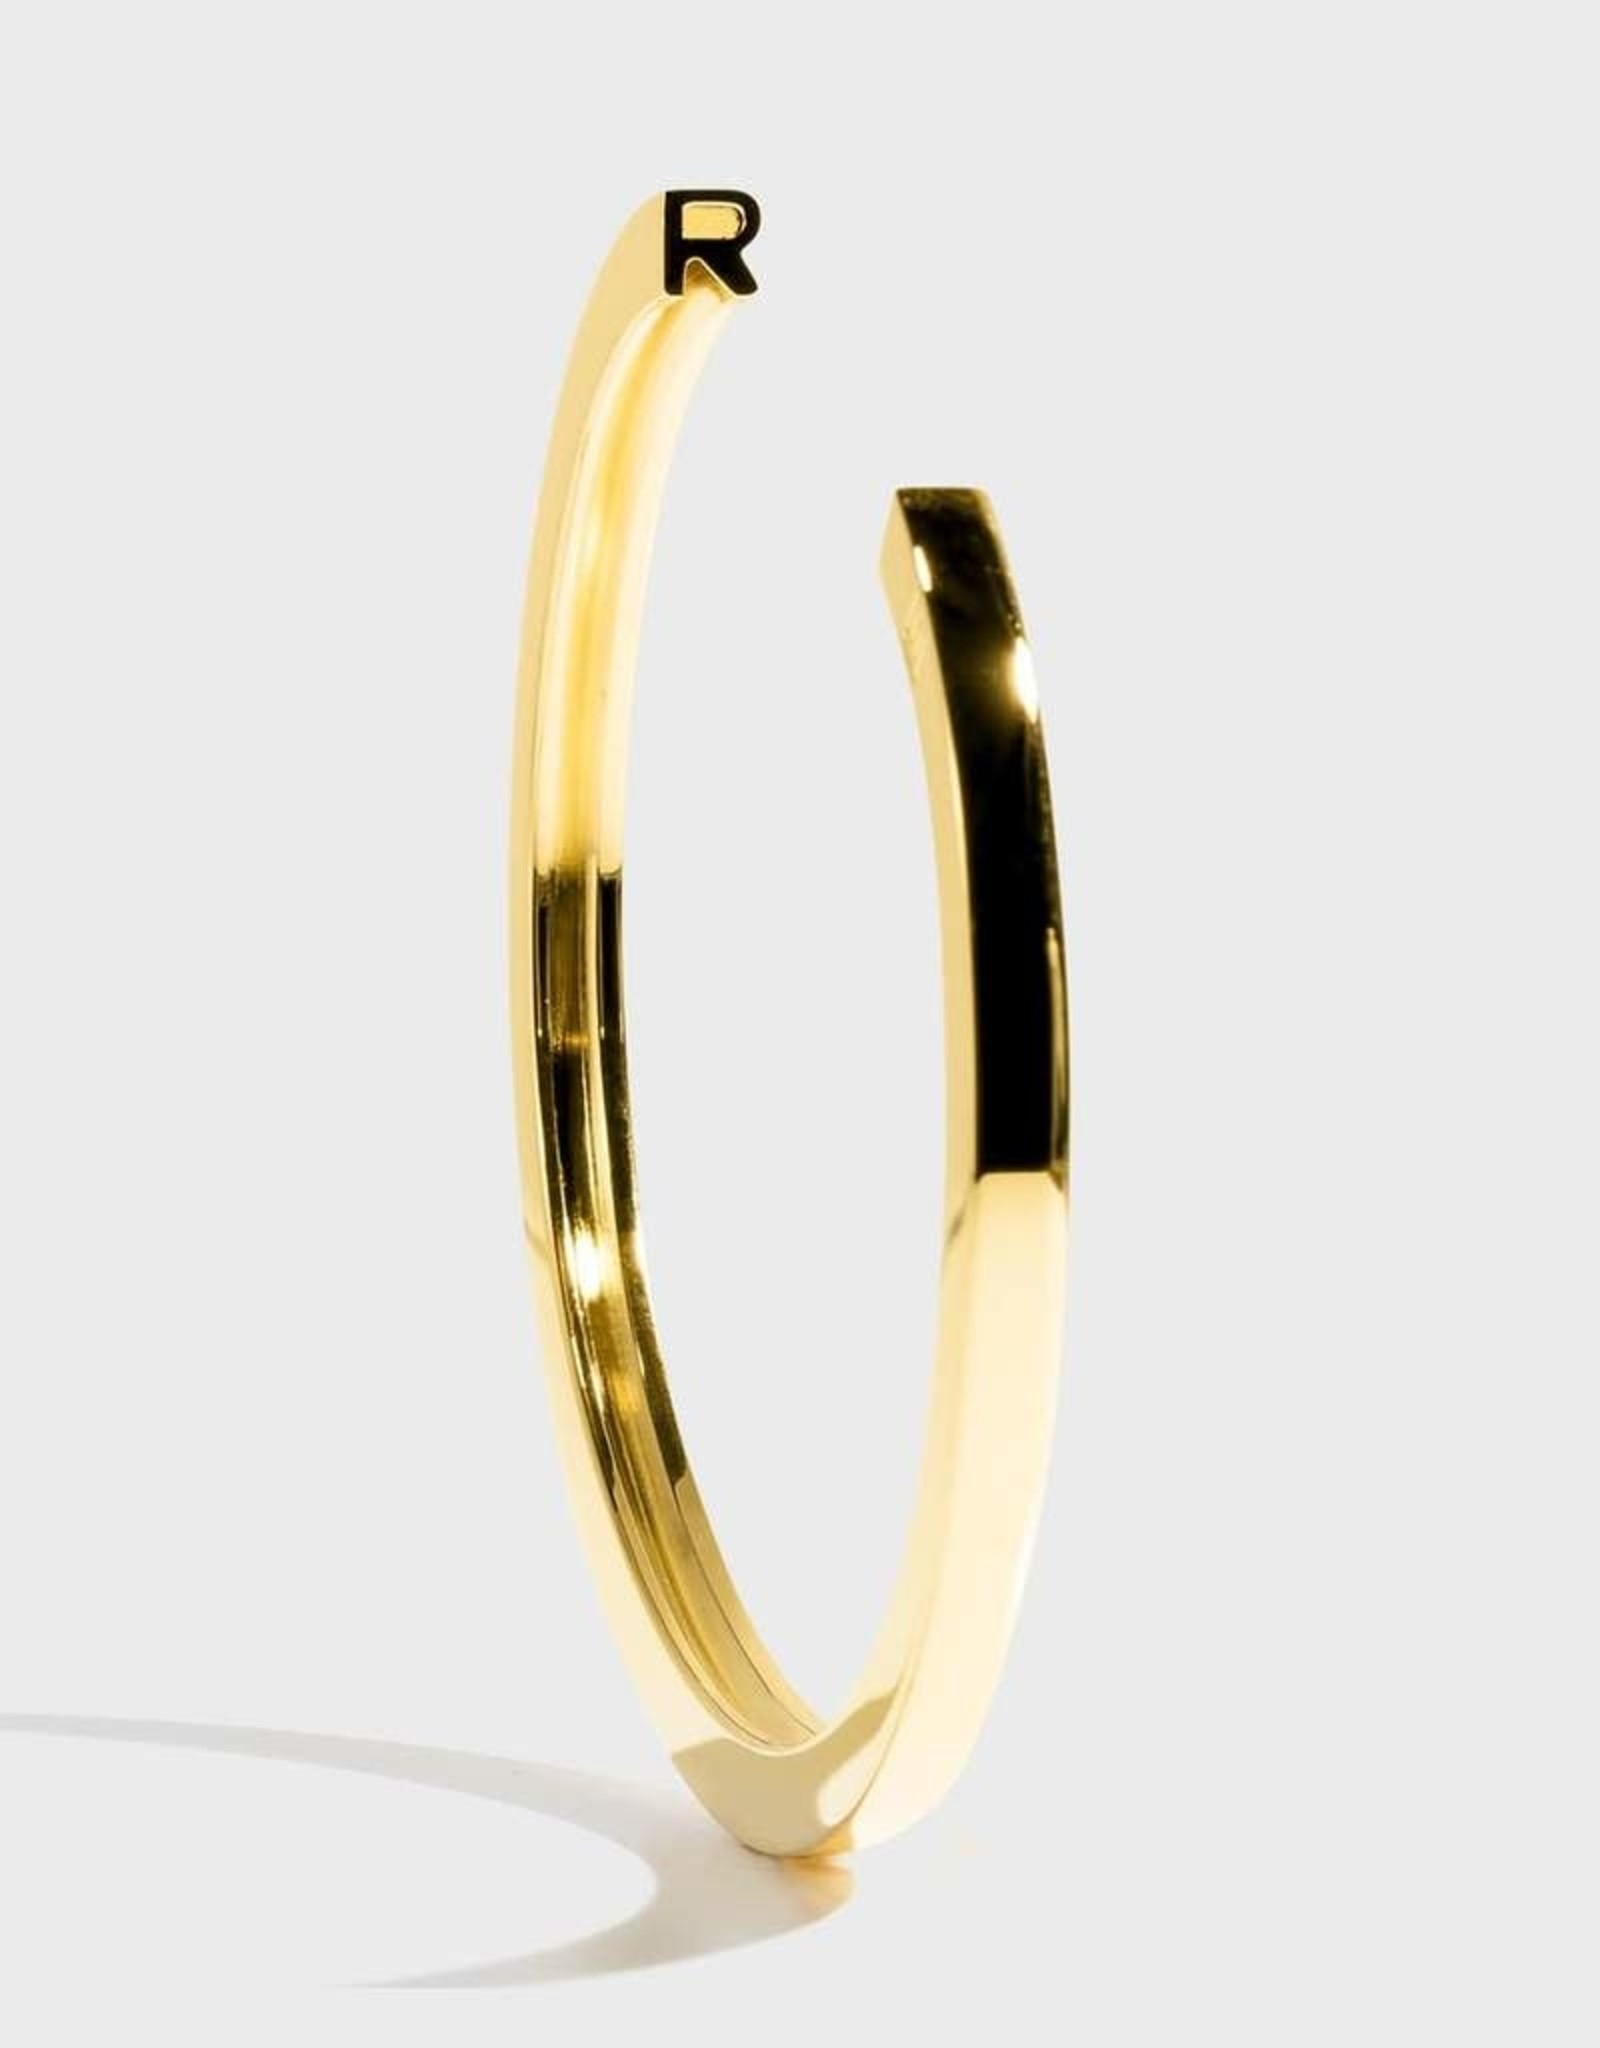 Stella Vale Initial Bracelet - R/Gold